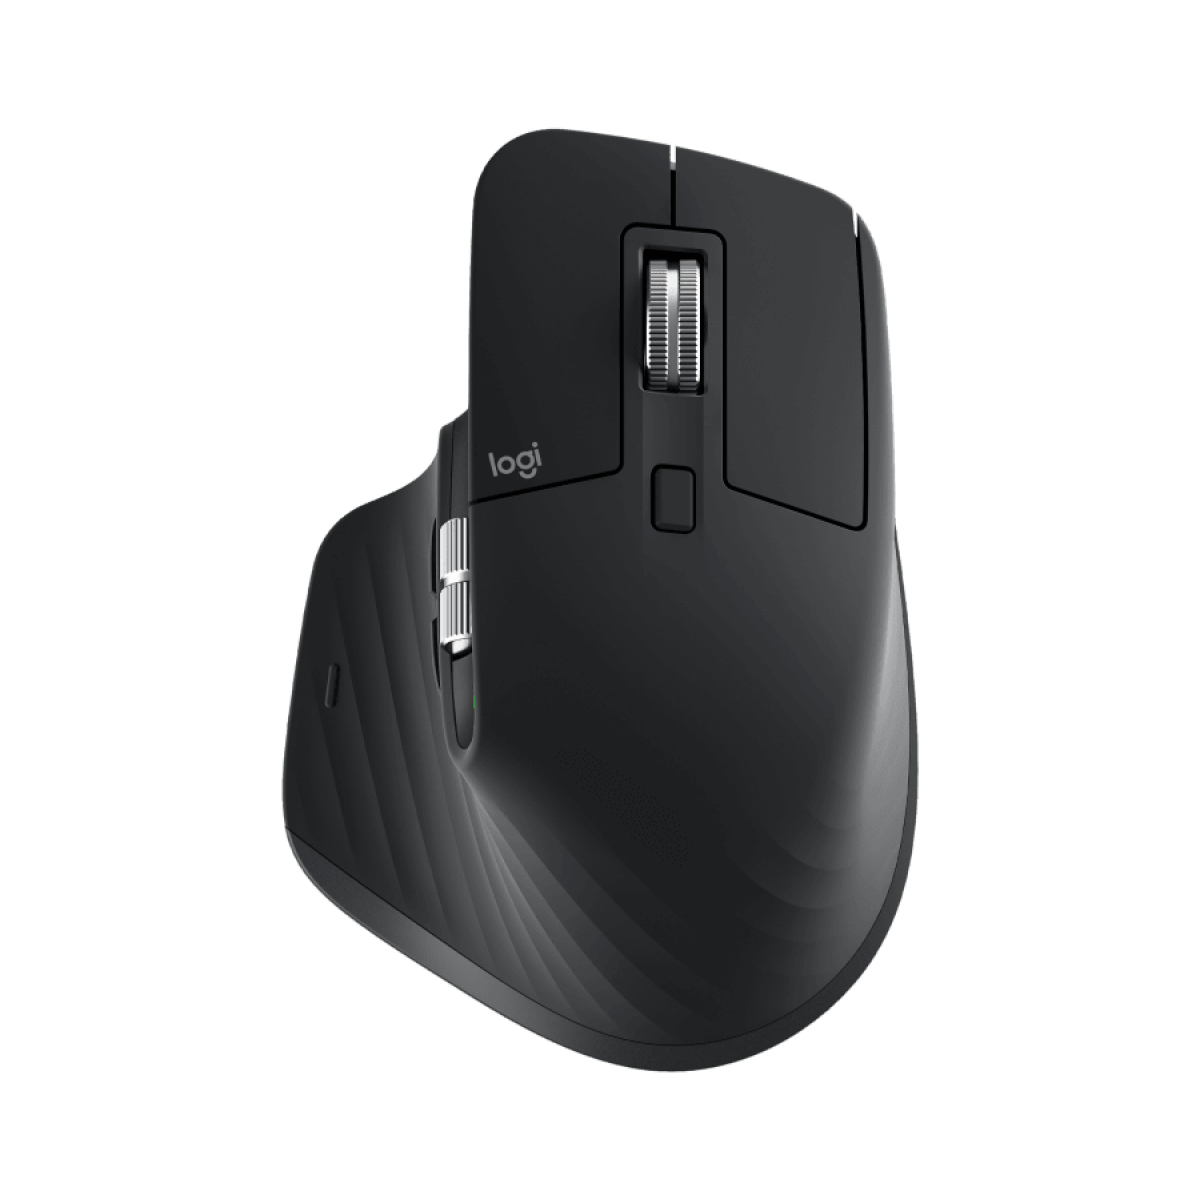 Mouse Wireless Logitech MX Master 3, 4000 DPI, 7 Botões, Black, 910-005647